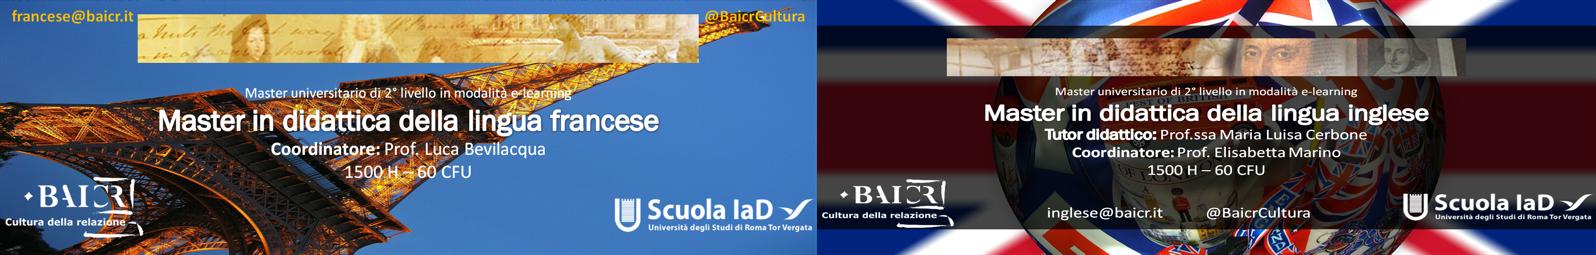 Master lingue straniere - didattica ING FRA.jpg